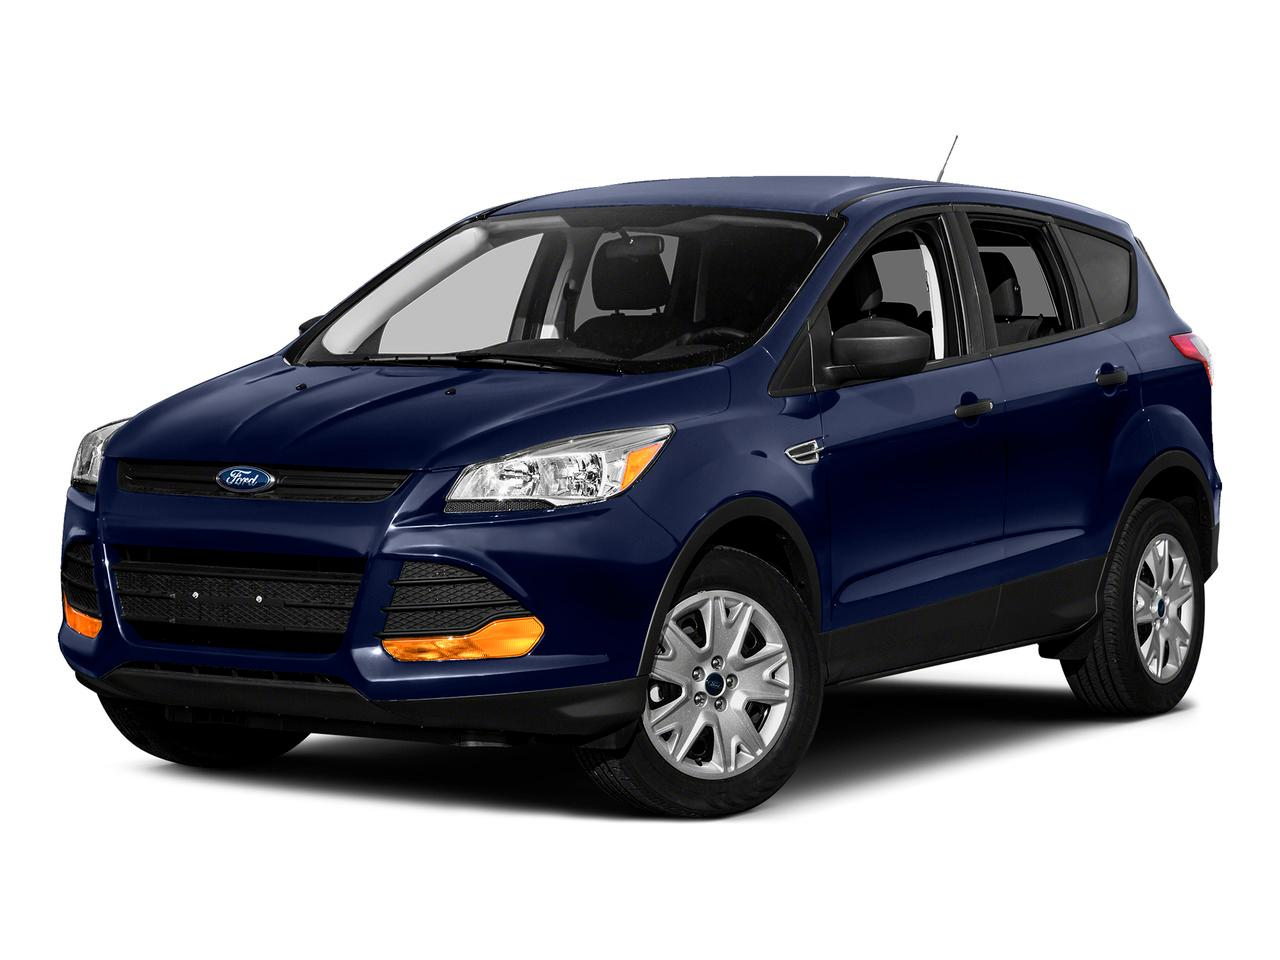 2015 Ford Escape Vehicle Photo in Charleston, SC 29407